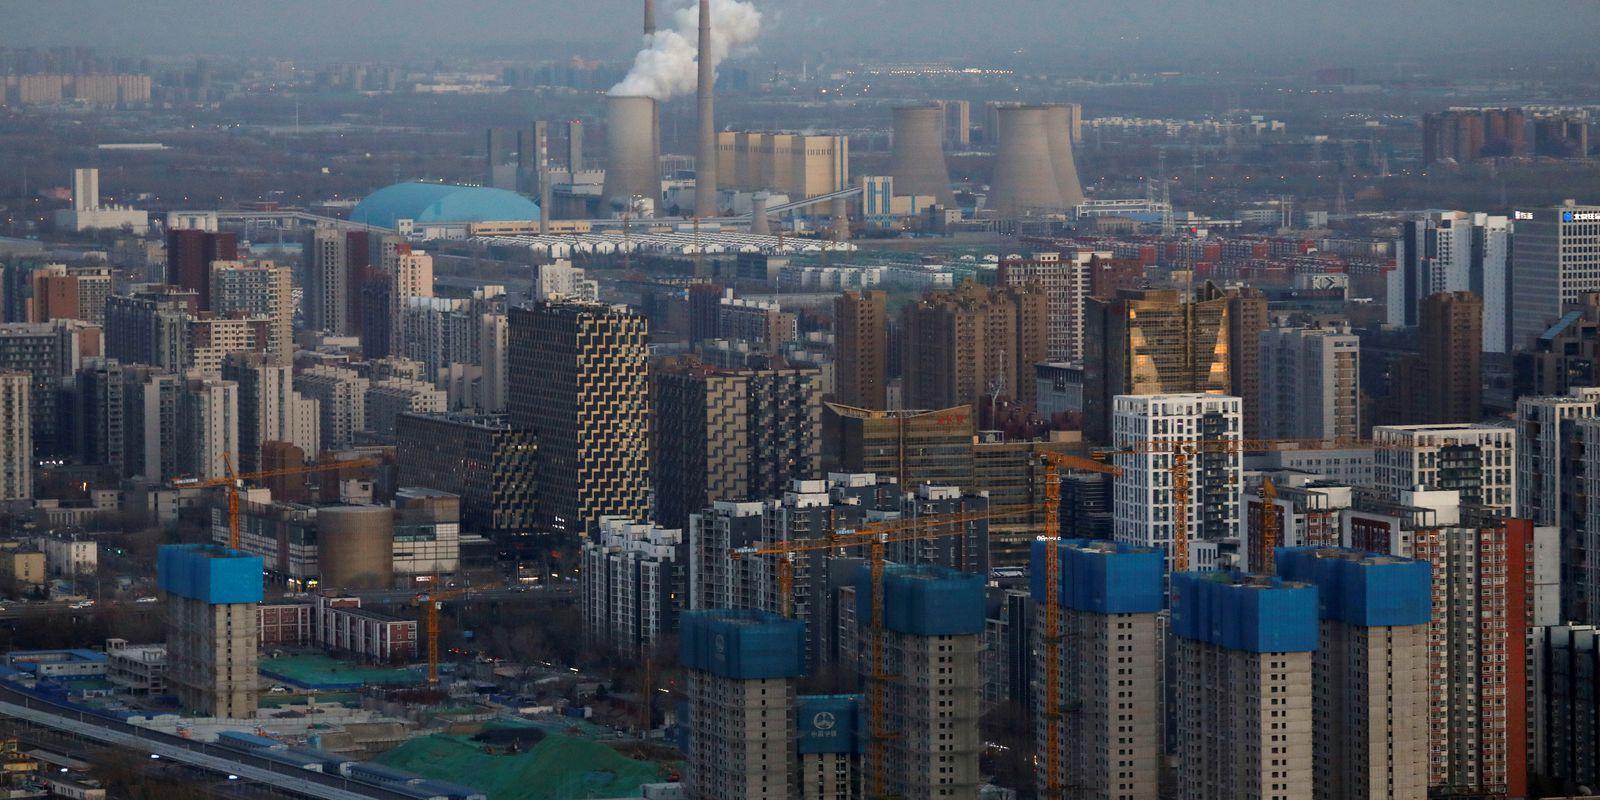 Distrito empresarial de Pequim. REUTERS/Tingshu Wang/File Photo